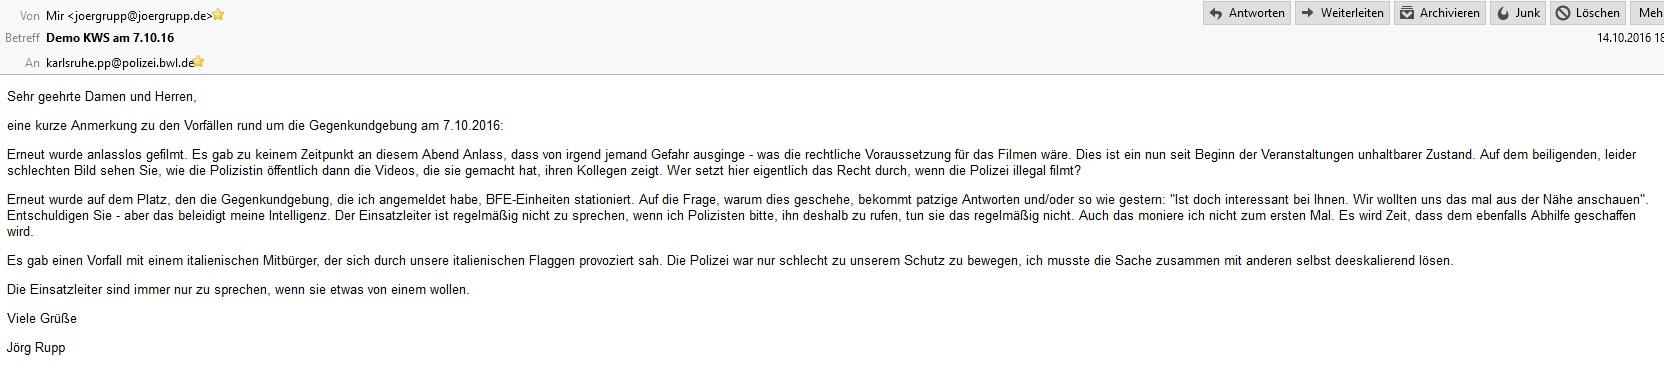 polizisten filem erlaubt